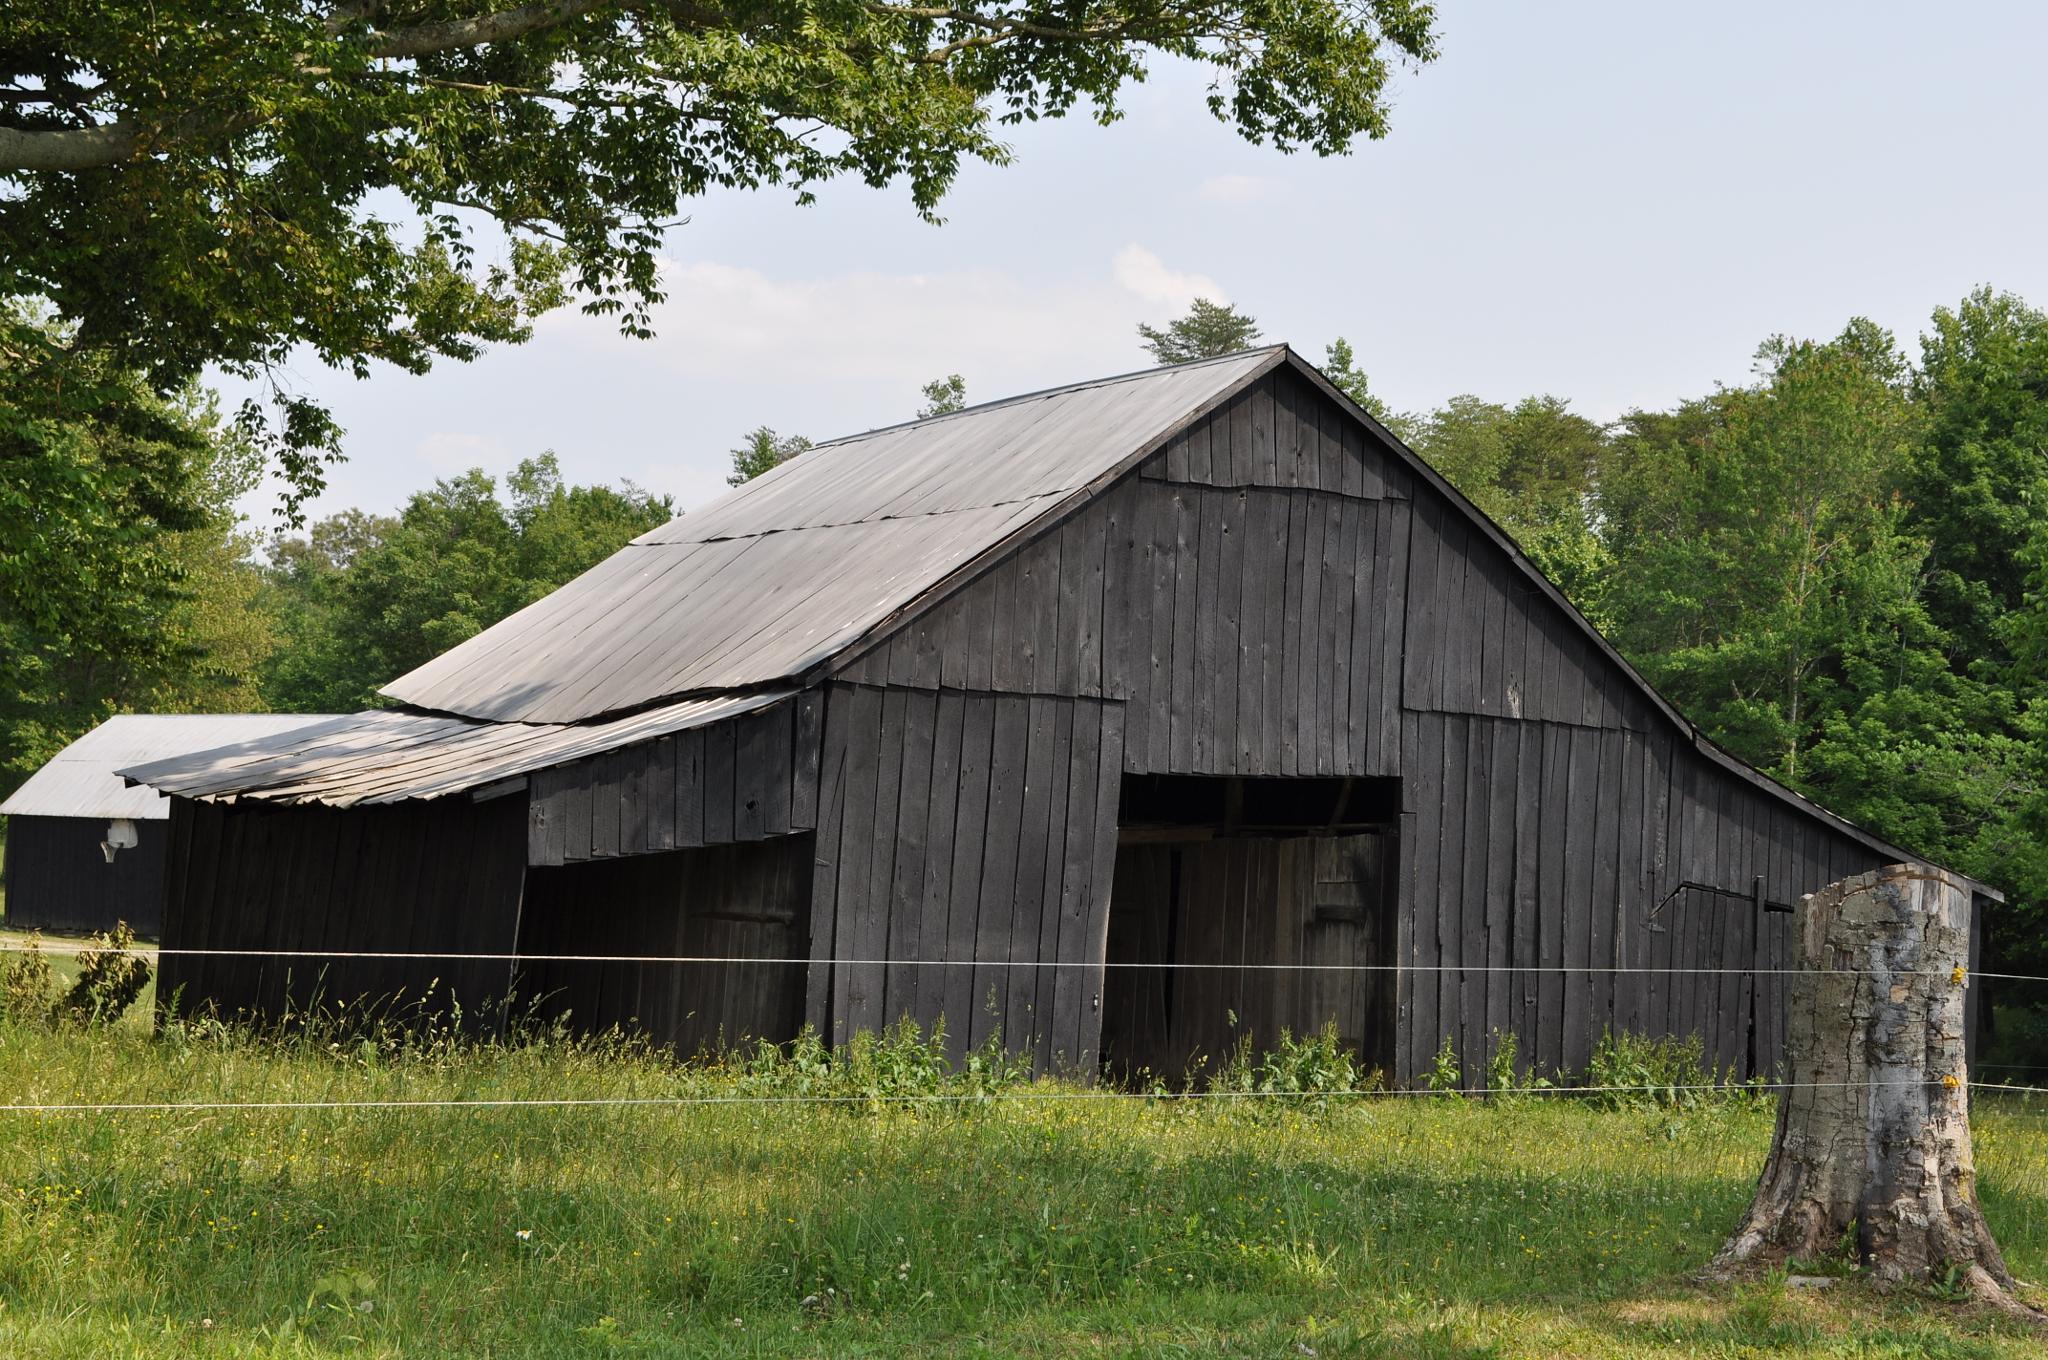 Kentucky Barn by tammy.palmer